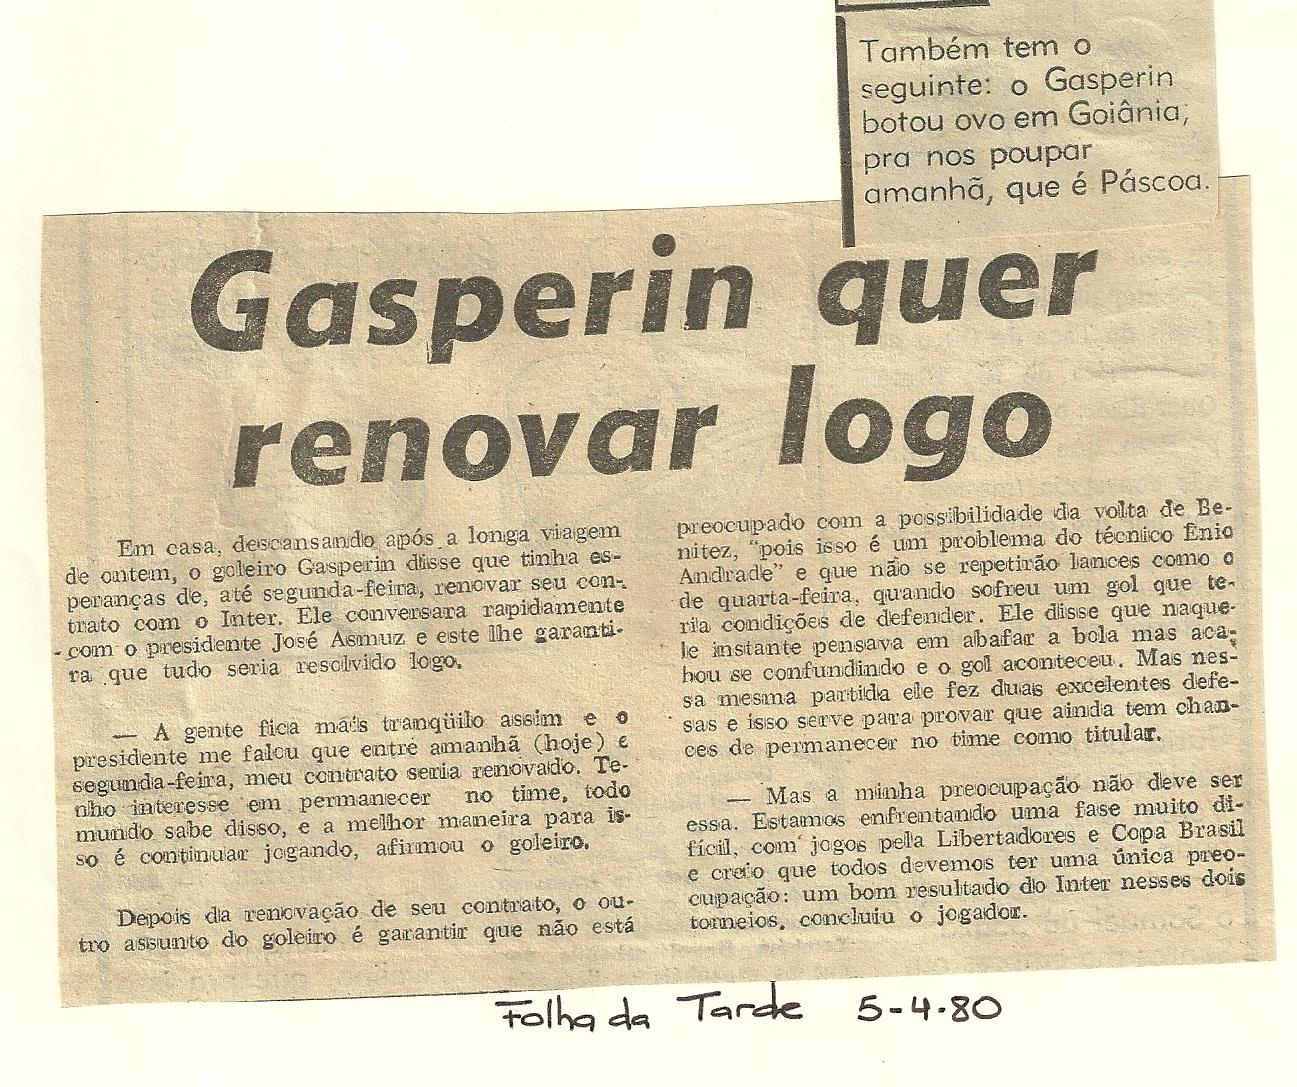 Folha da Tarde 05041980 Gasperin quer renovar logo.jpg